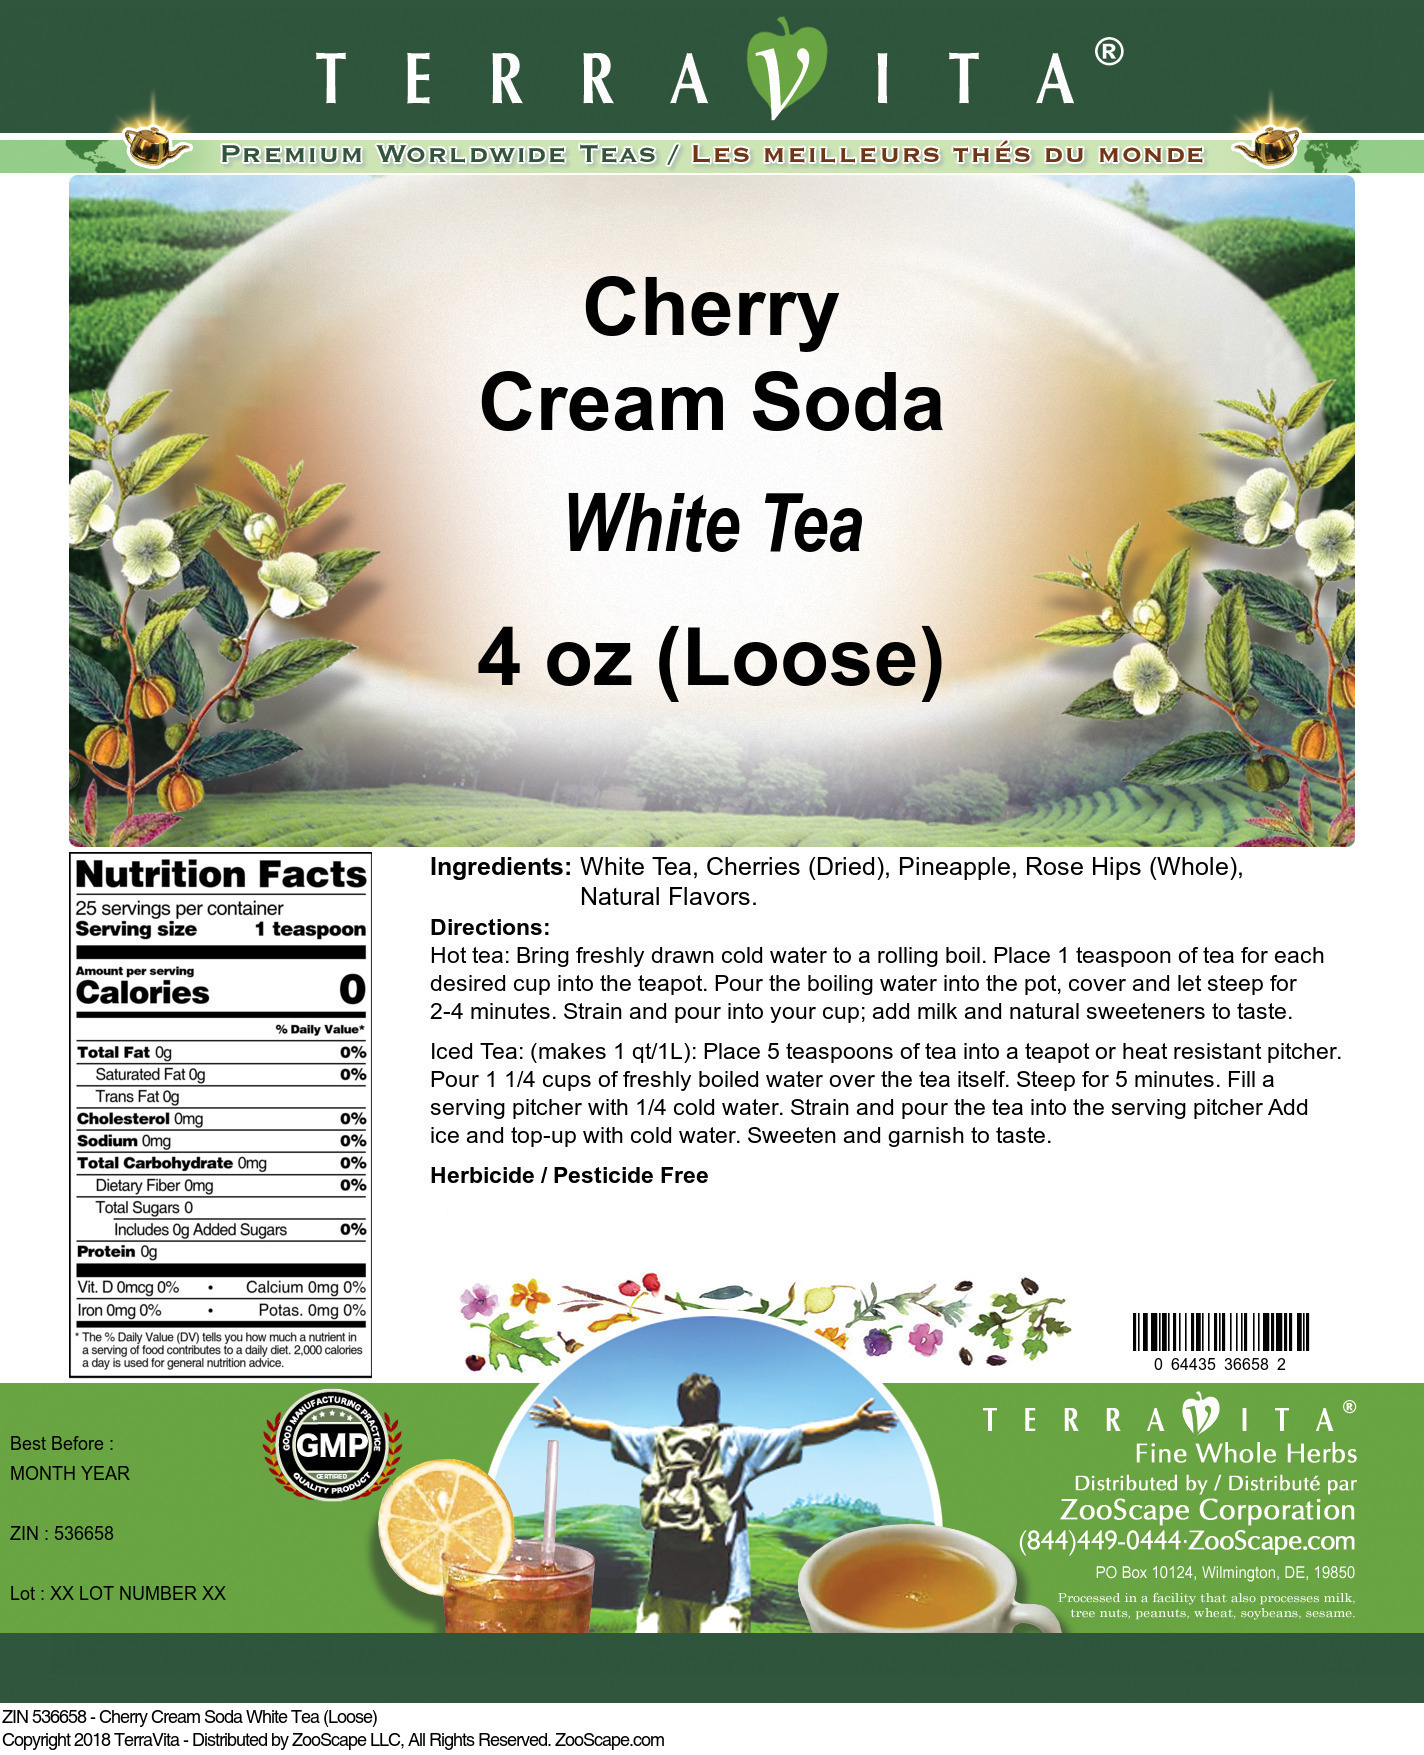 Cherry Cream Soda White Tea (Loose)